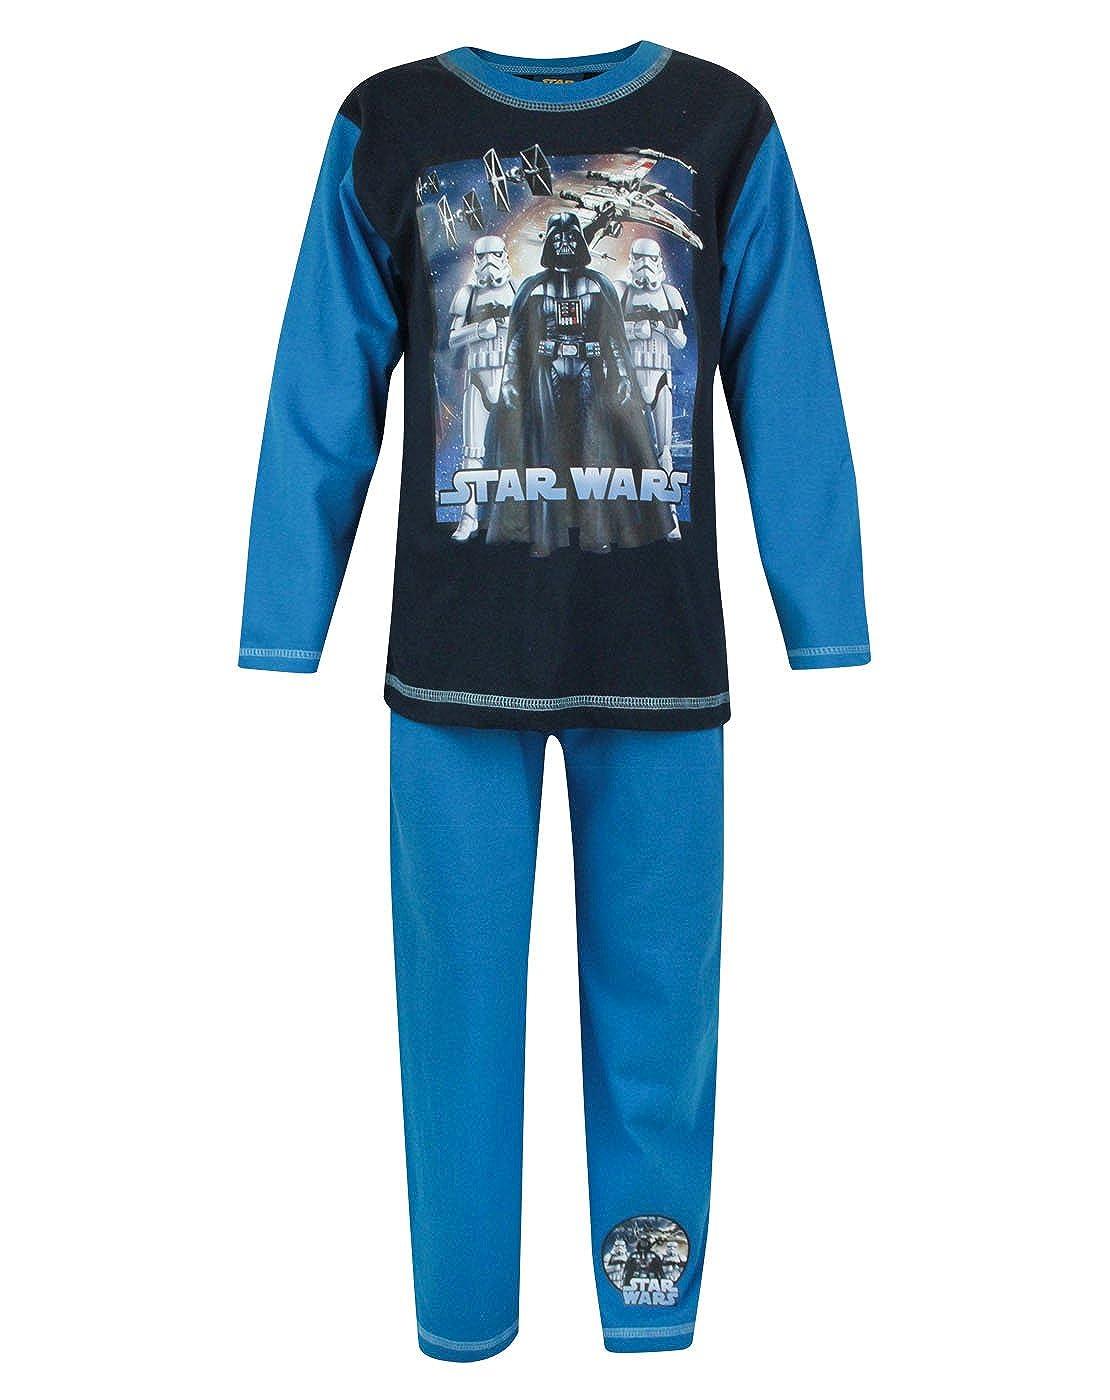 Official Star Wars Boy's Pyjamas